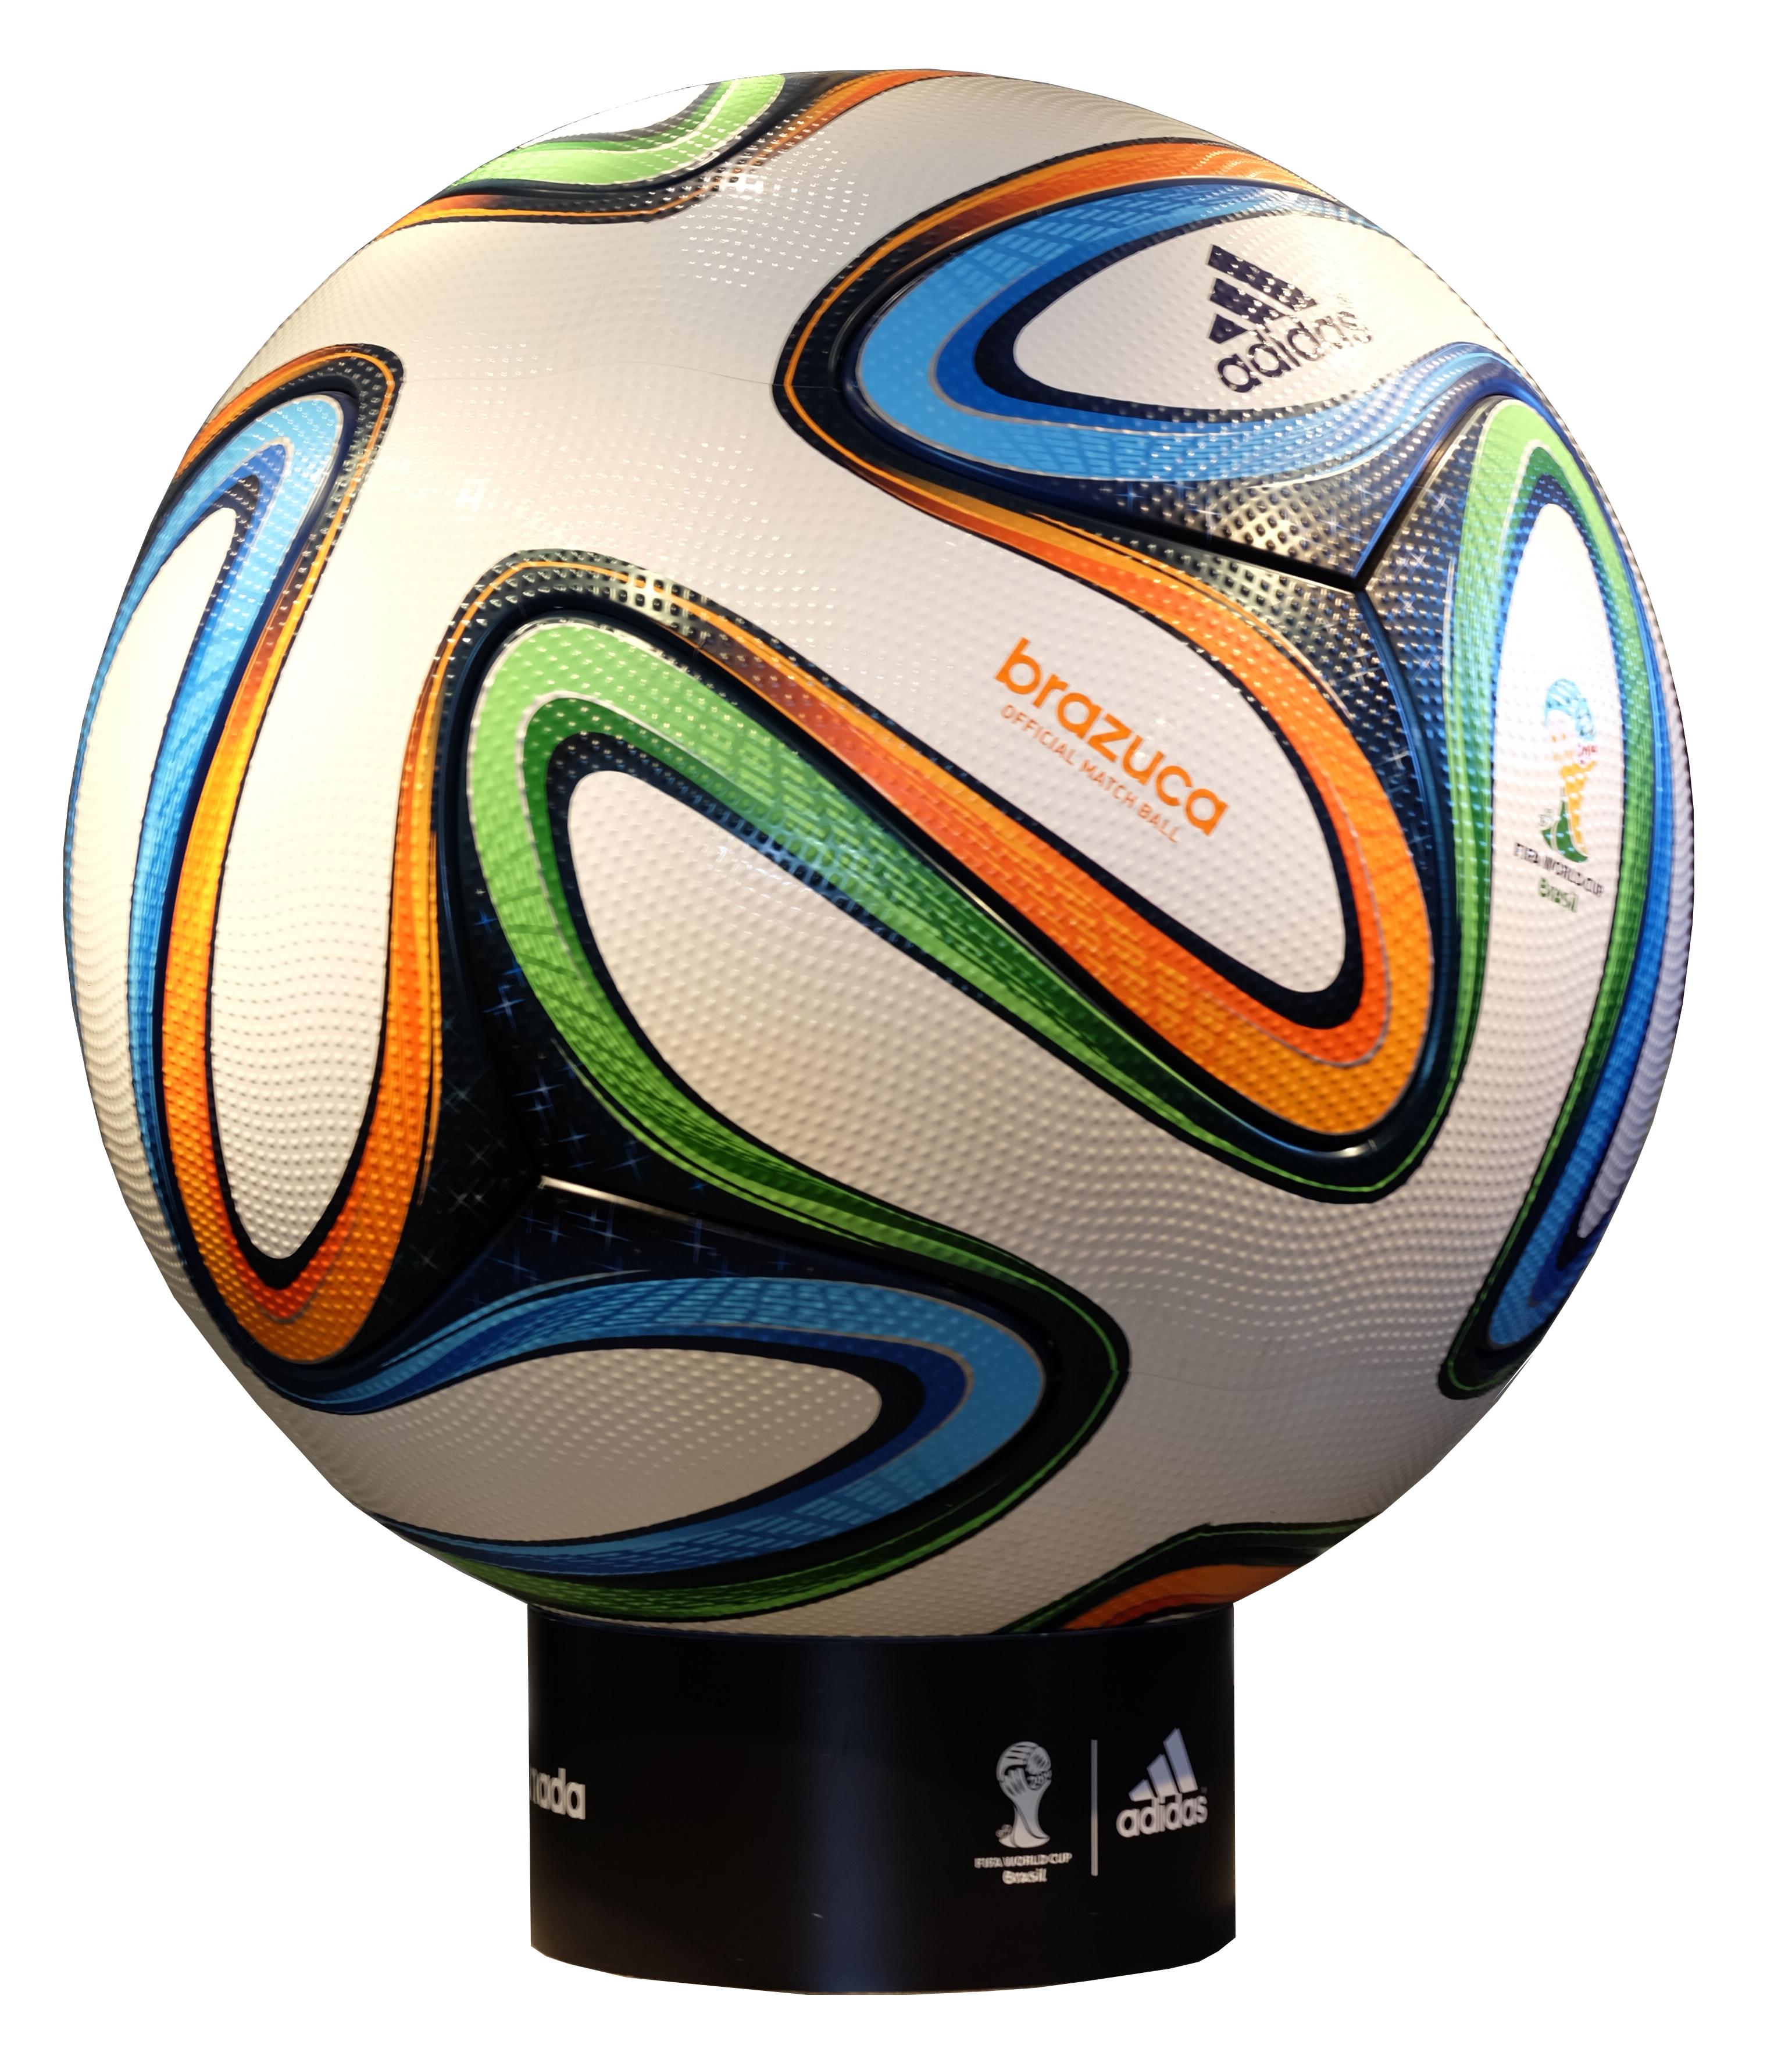 Ball lose-1